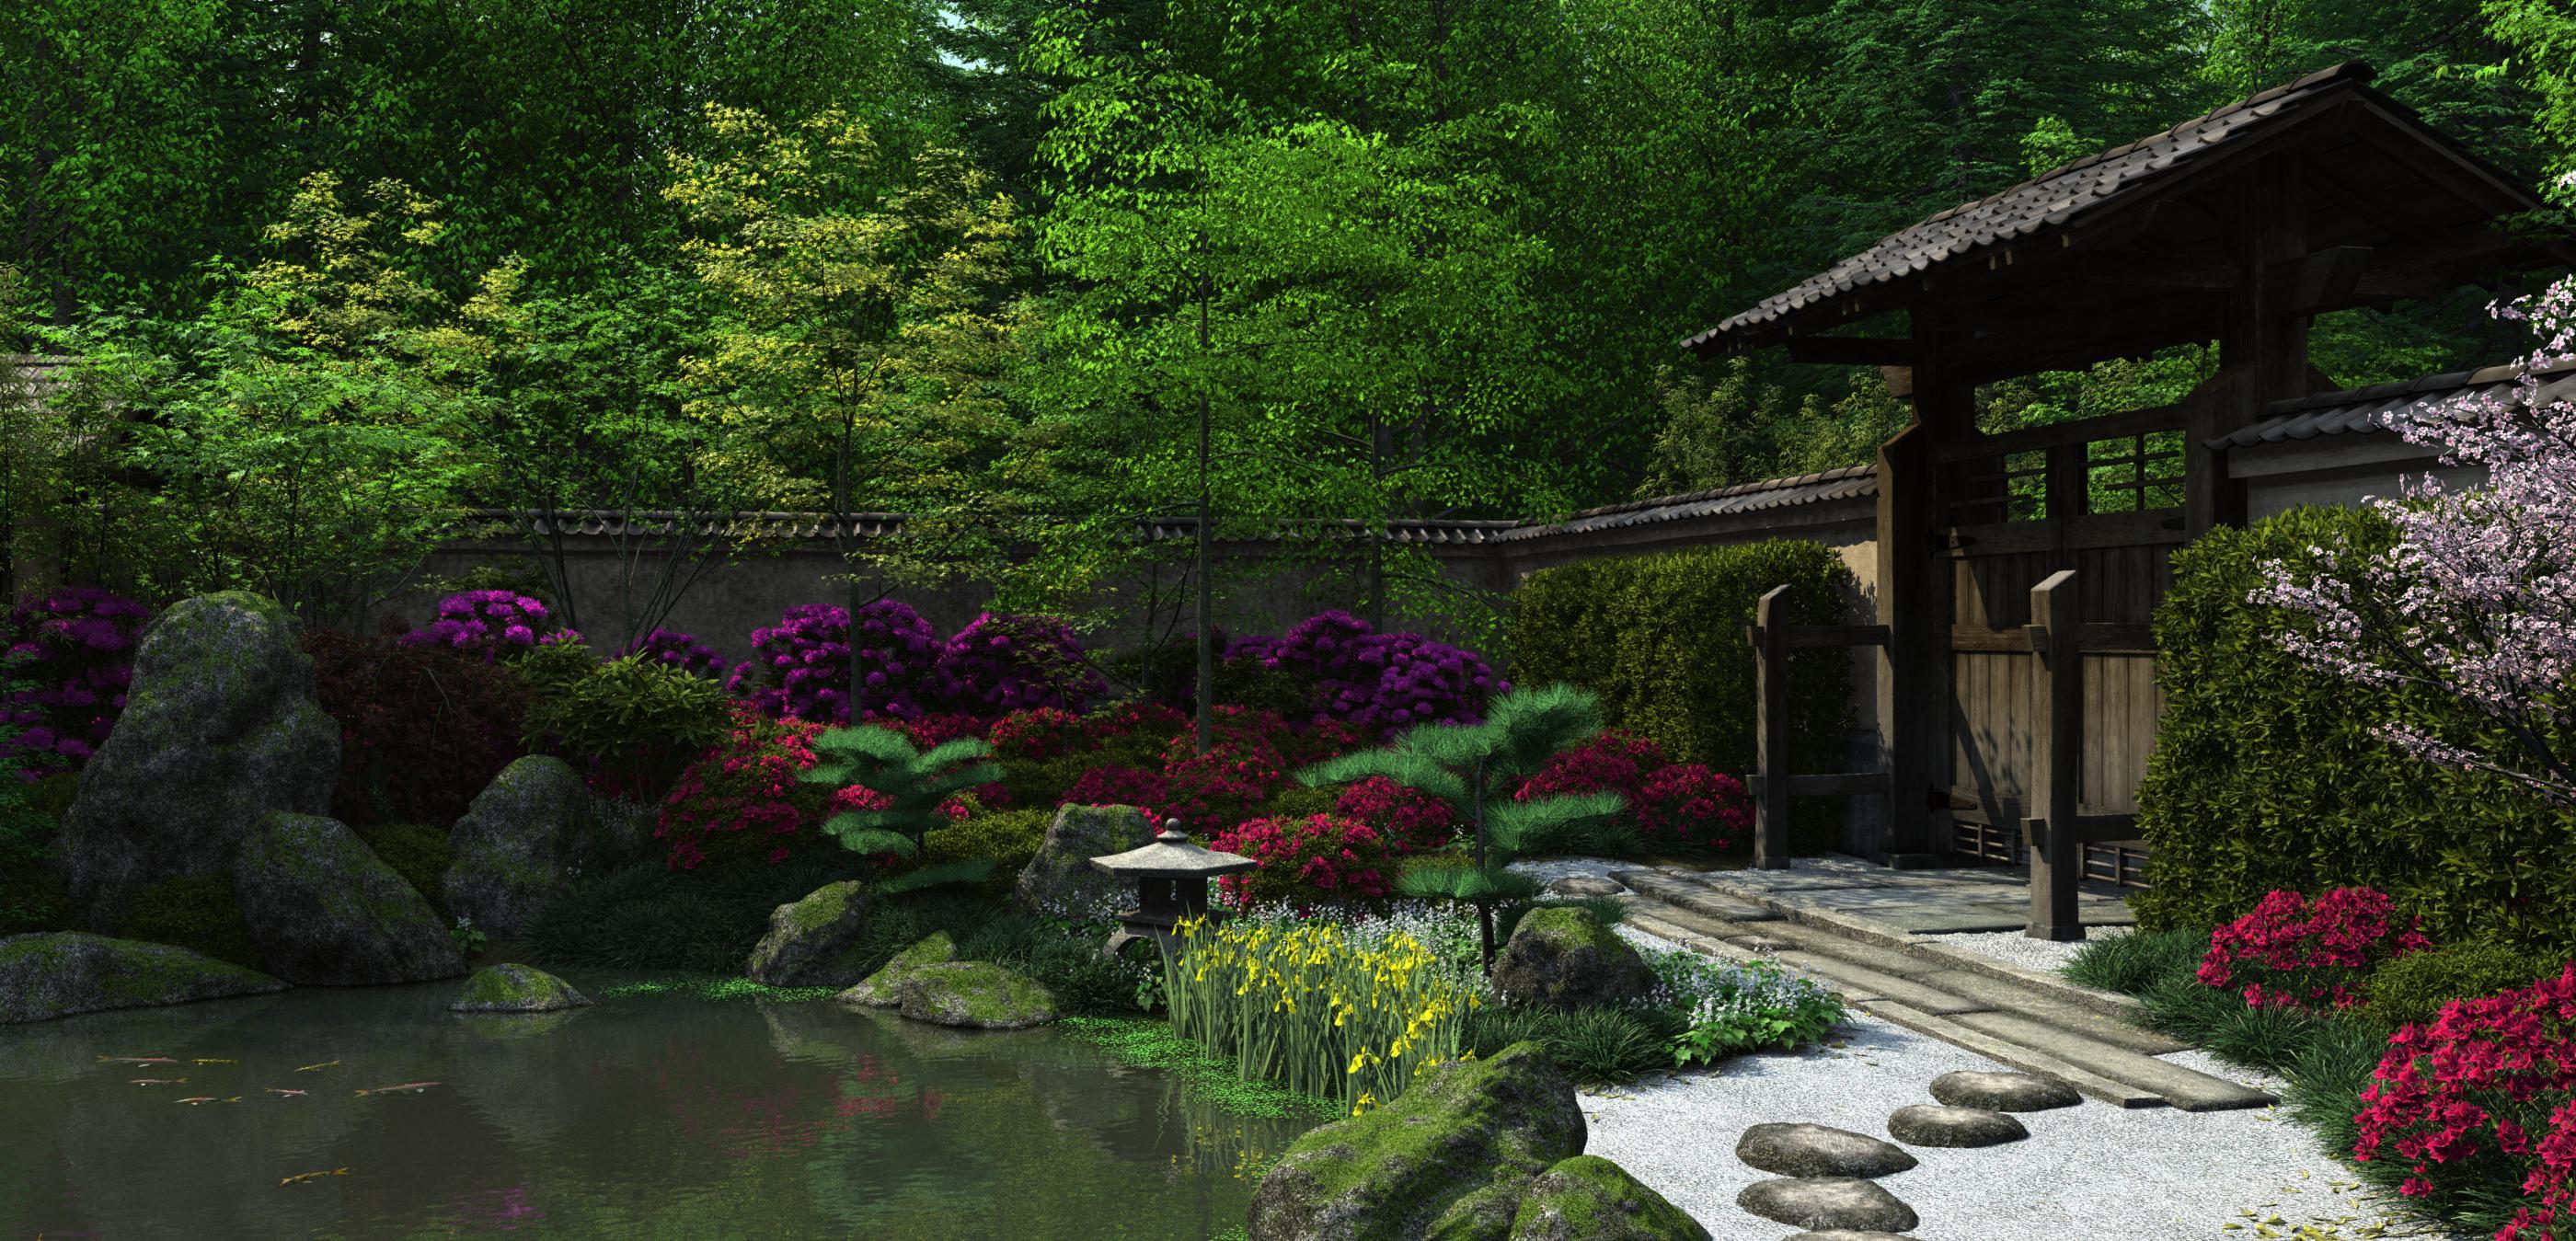 Japanese garden by jules2626 on deviantart for A japanese garden